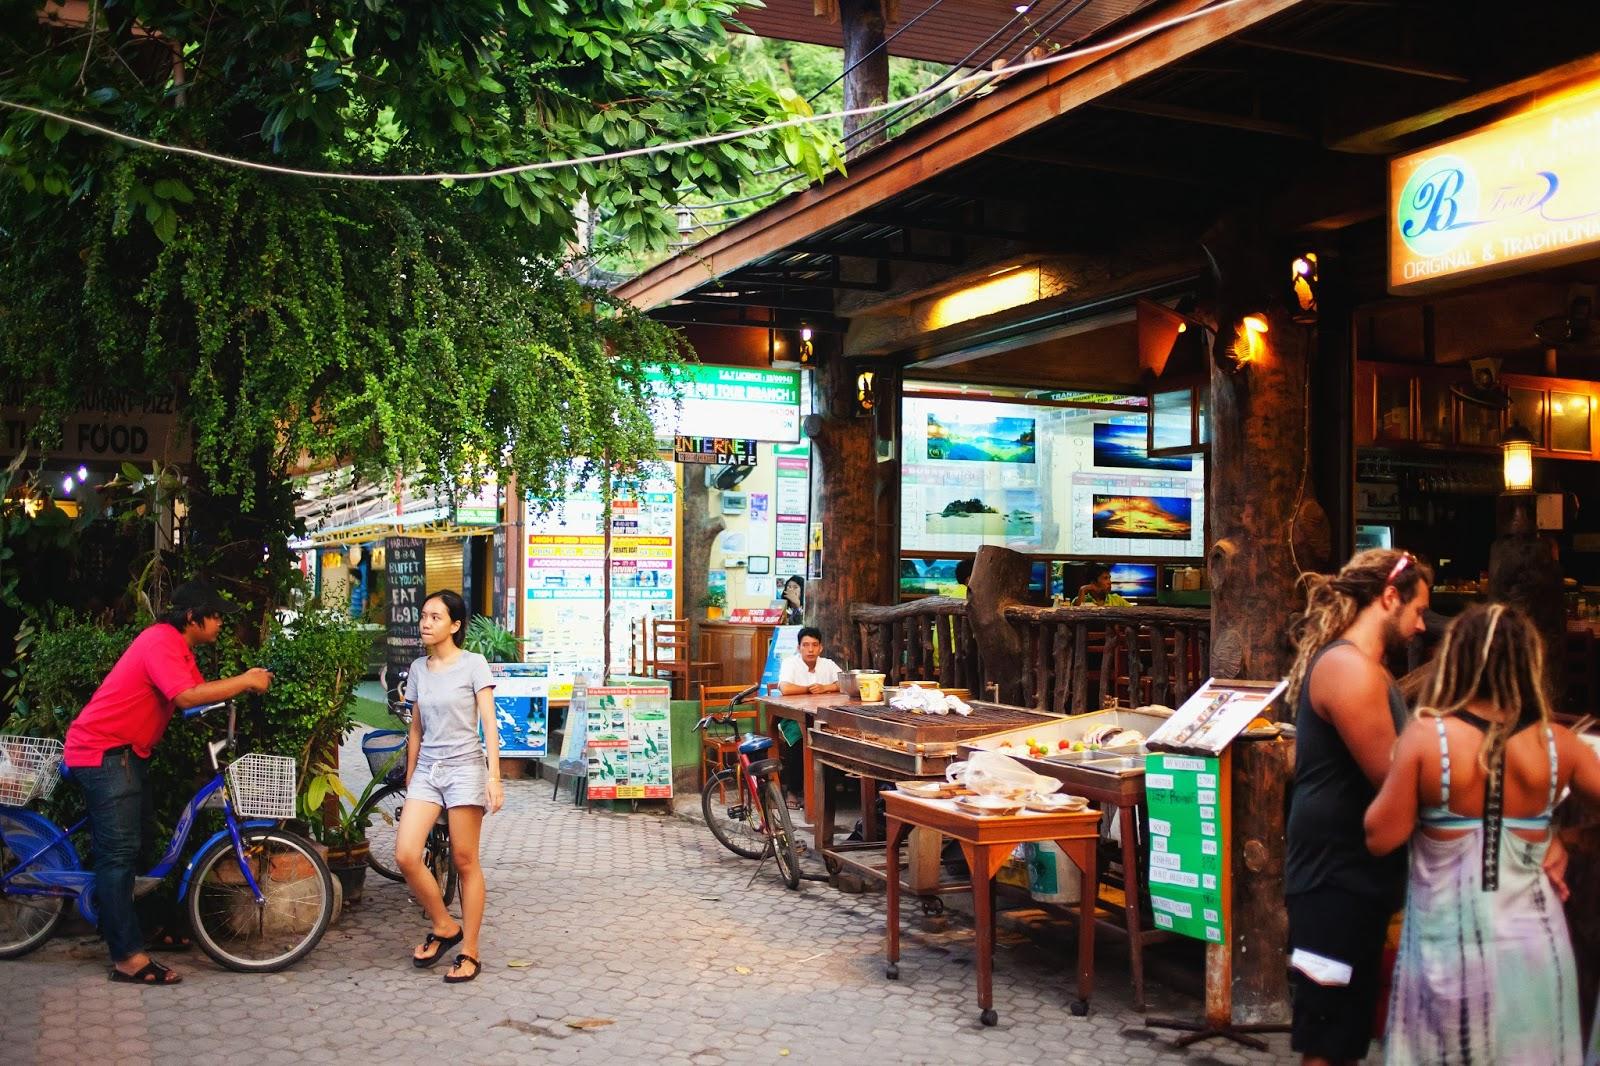 Пхи-Пхи отдых в Таиланде